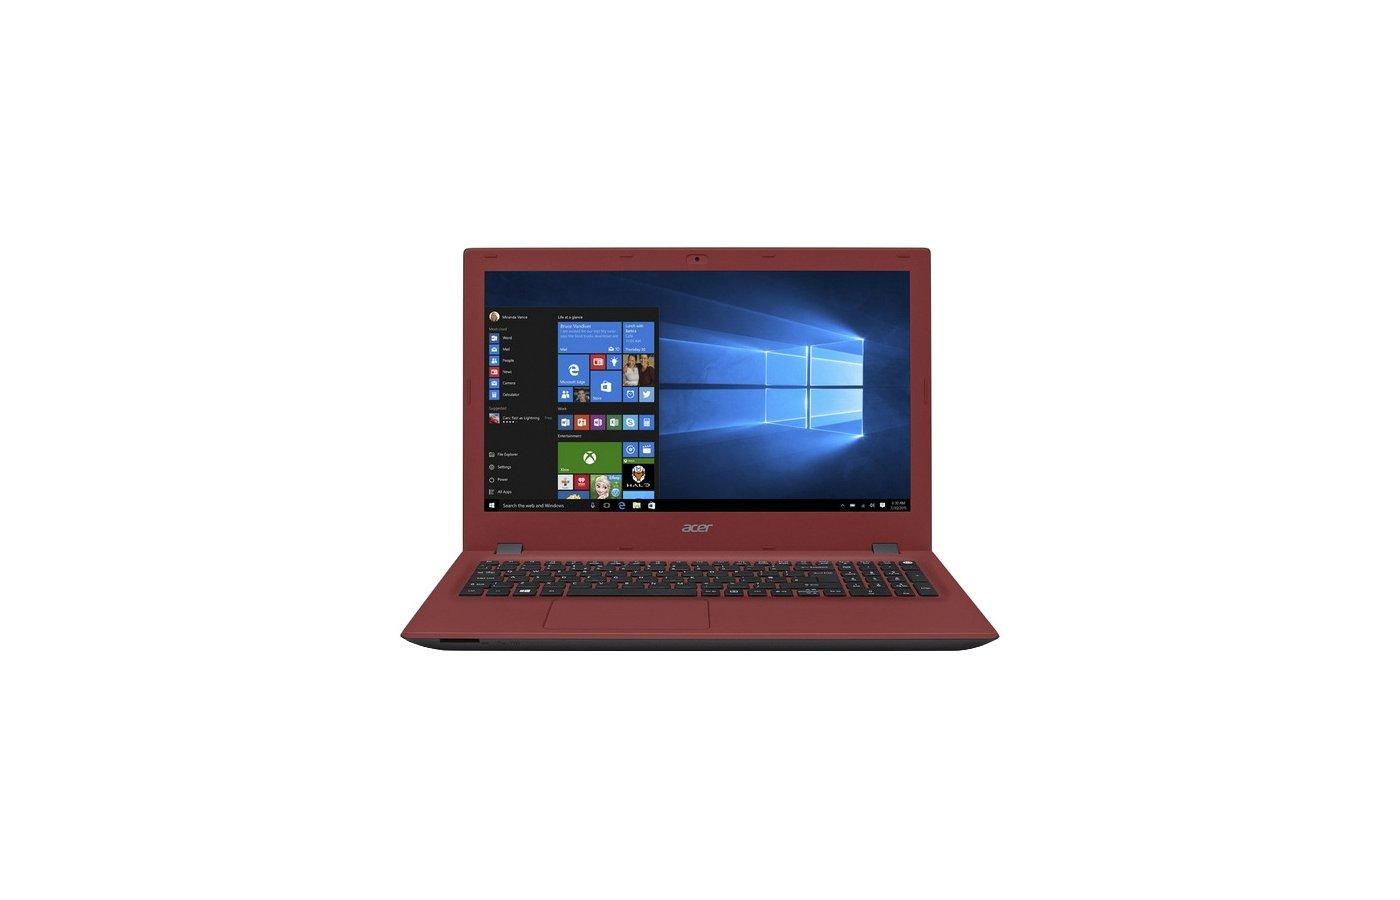 Ноутбук Acer E5-532G-P5FA /NX.MZ3ER.004/ intel N3700/4Gb/500Gb/GF 920M 2Gb/DVDRW/15.6/WiFi/Win10 (Red)